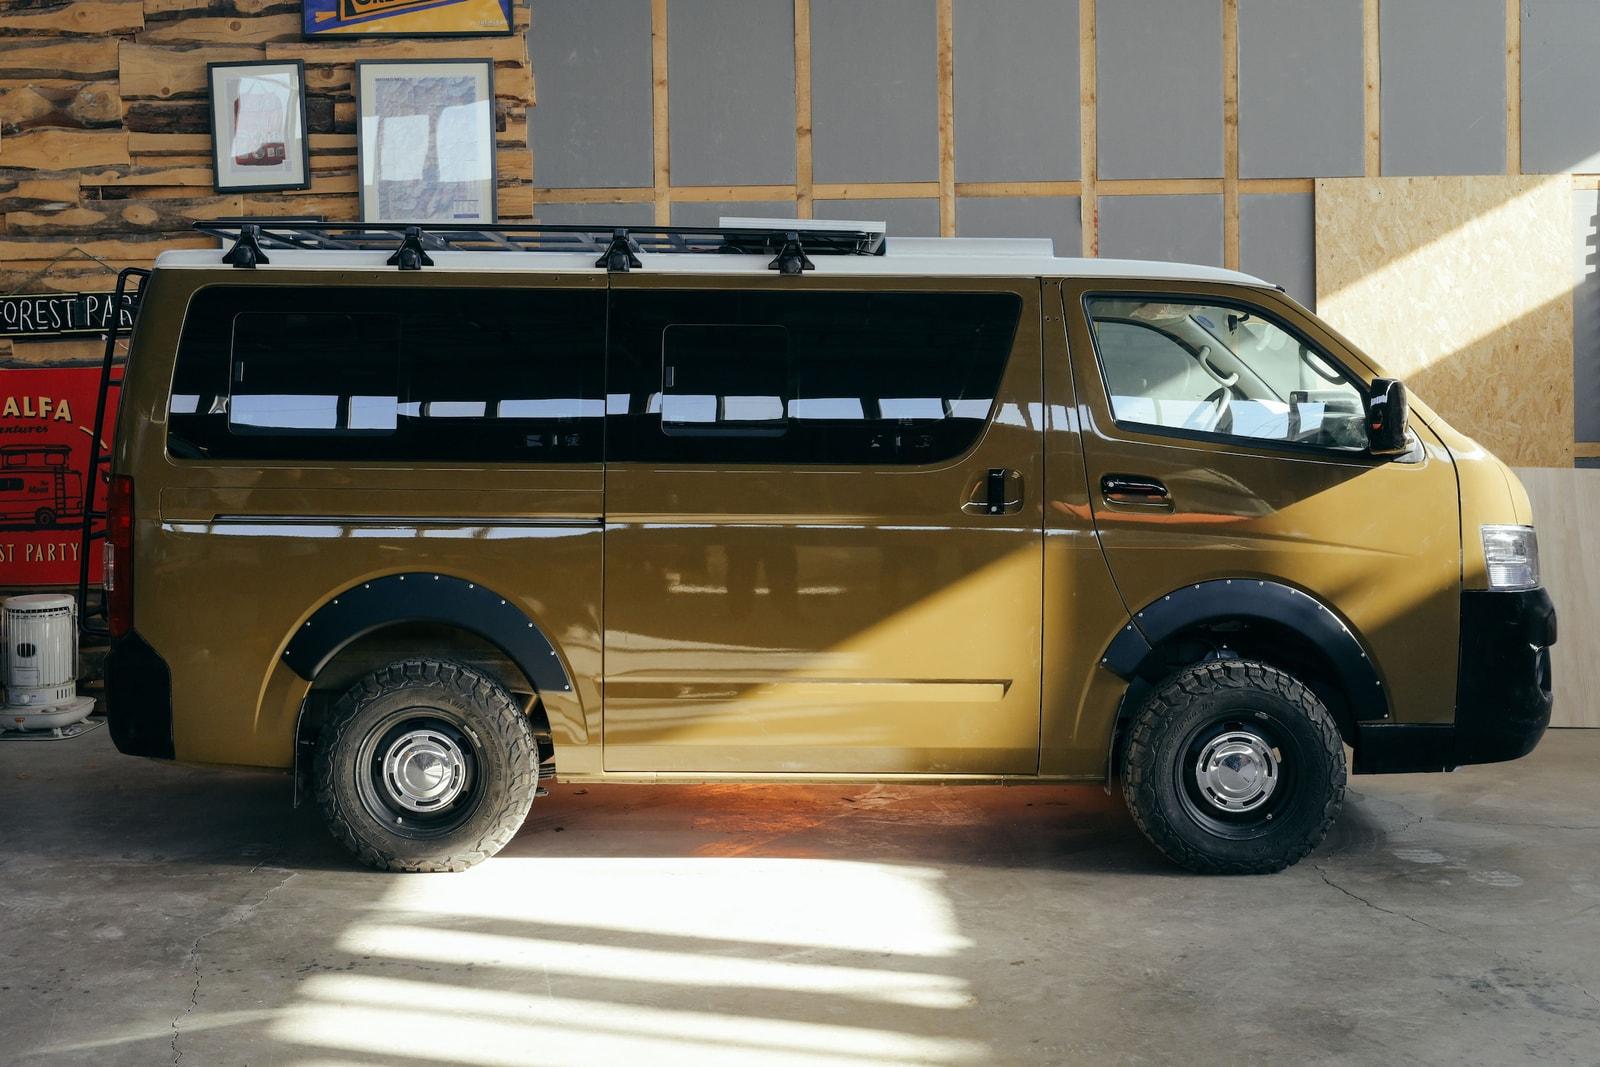 Vanlife 生活方式興起,如何打造一台真正的 Camper Van?  THROTTLE